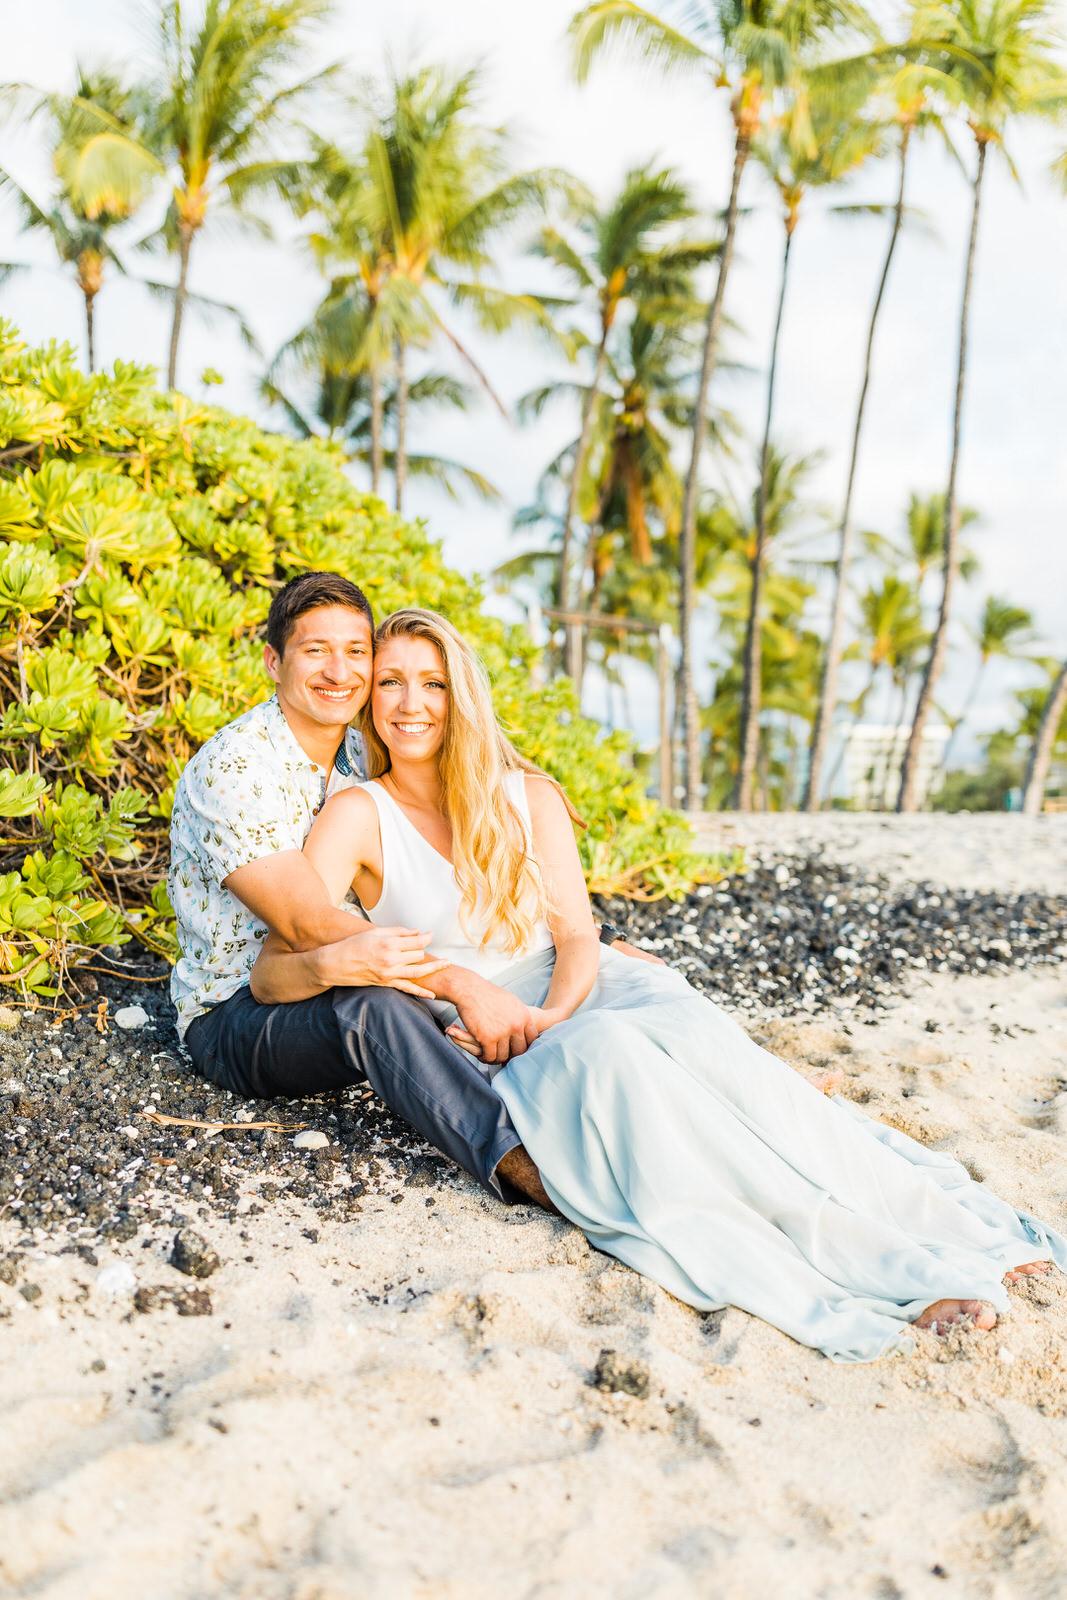 sunset-adventurous-couple-water-session-hilton-hawaii-3.jpg